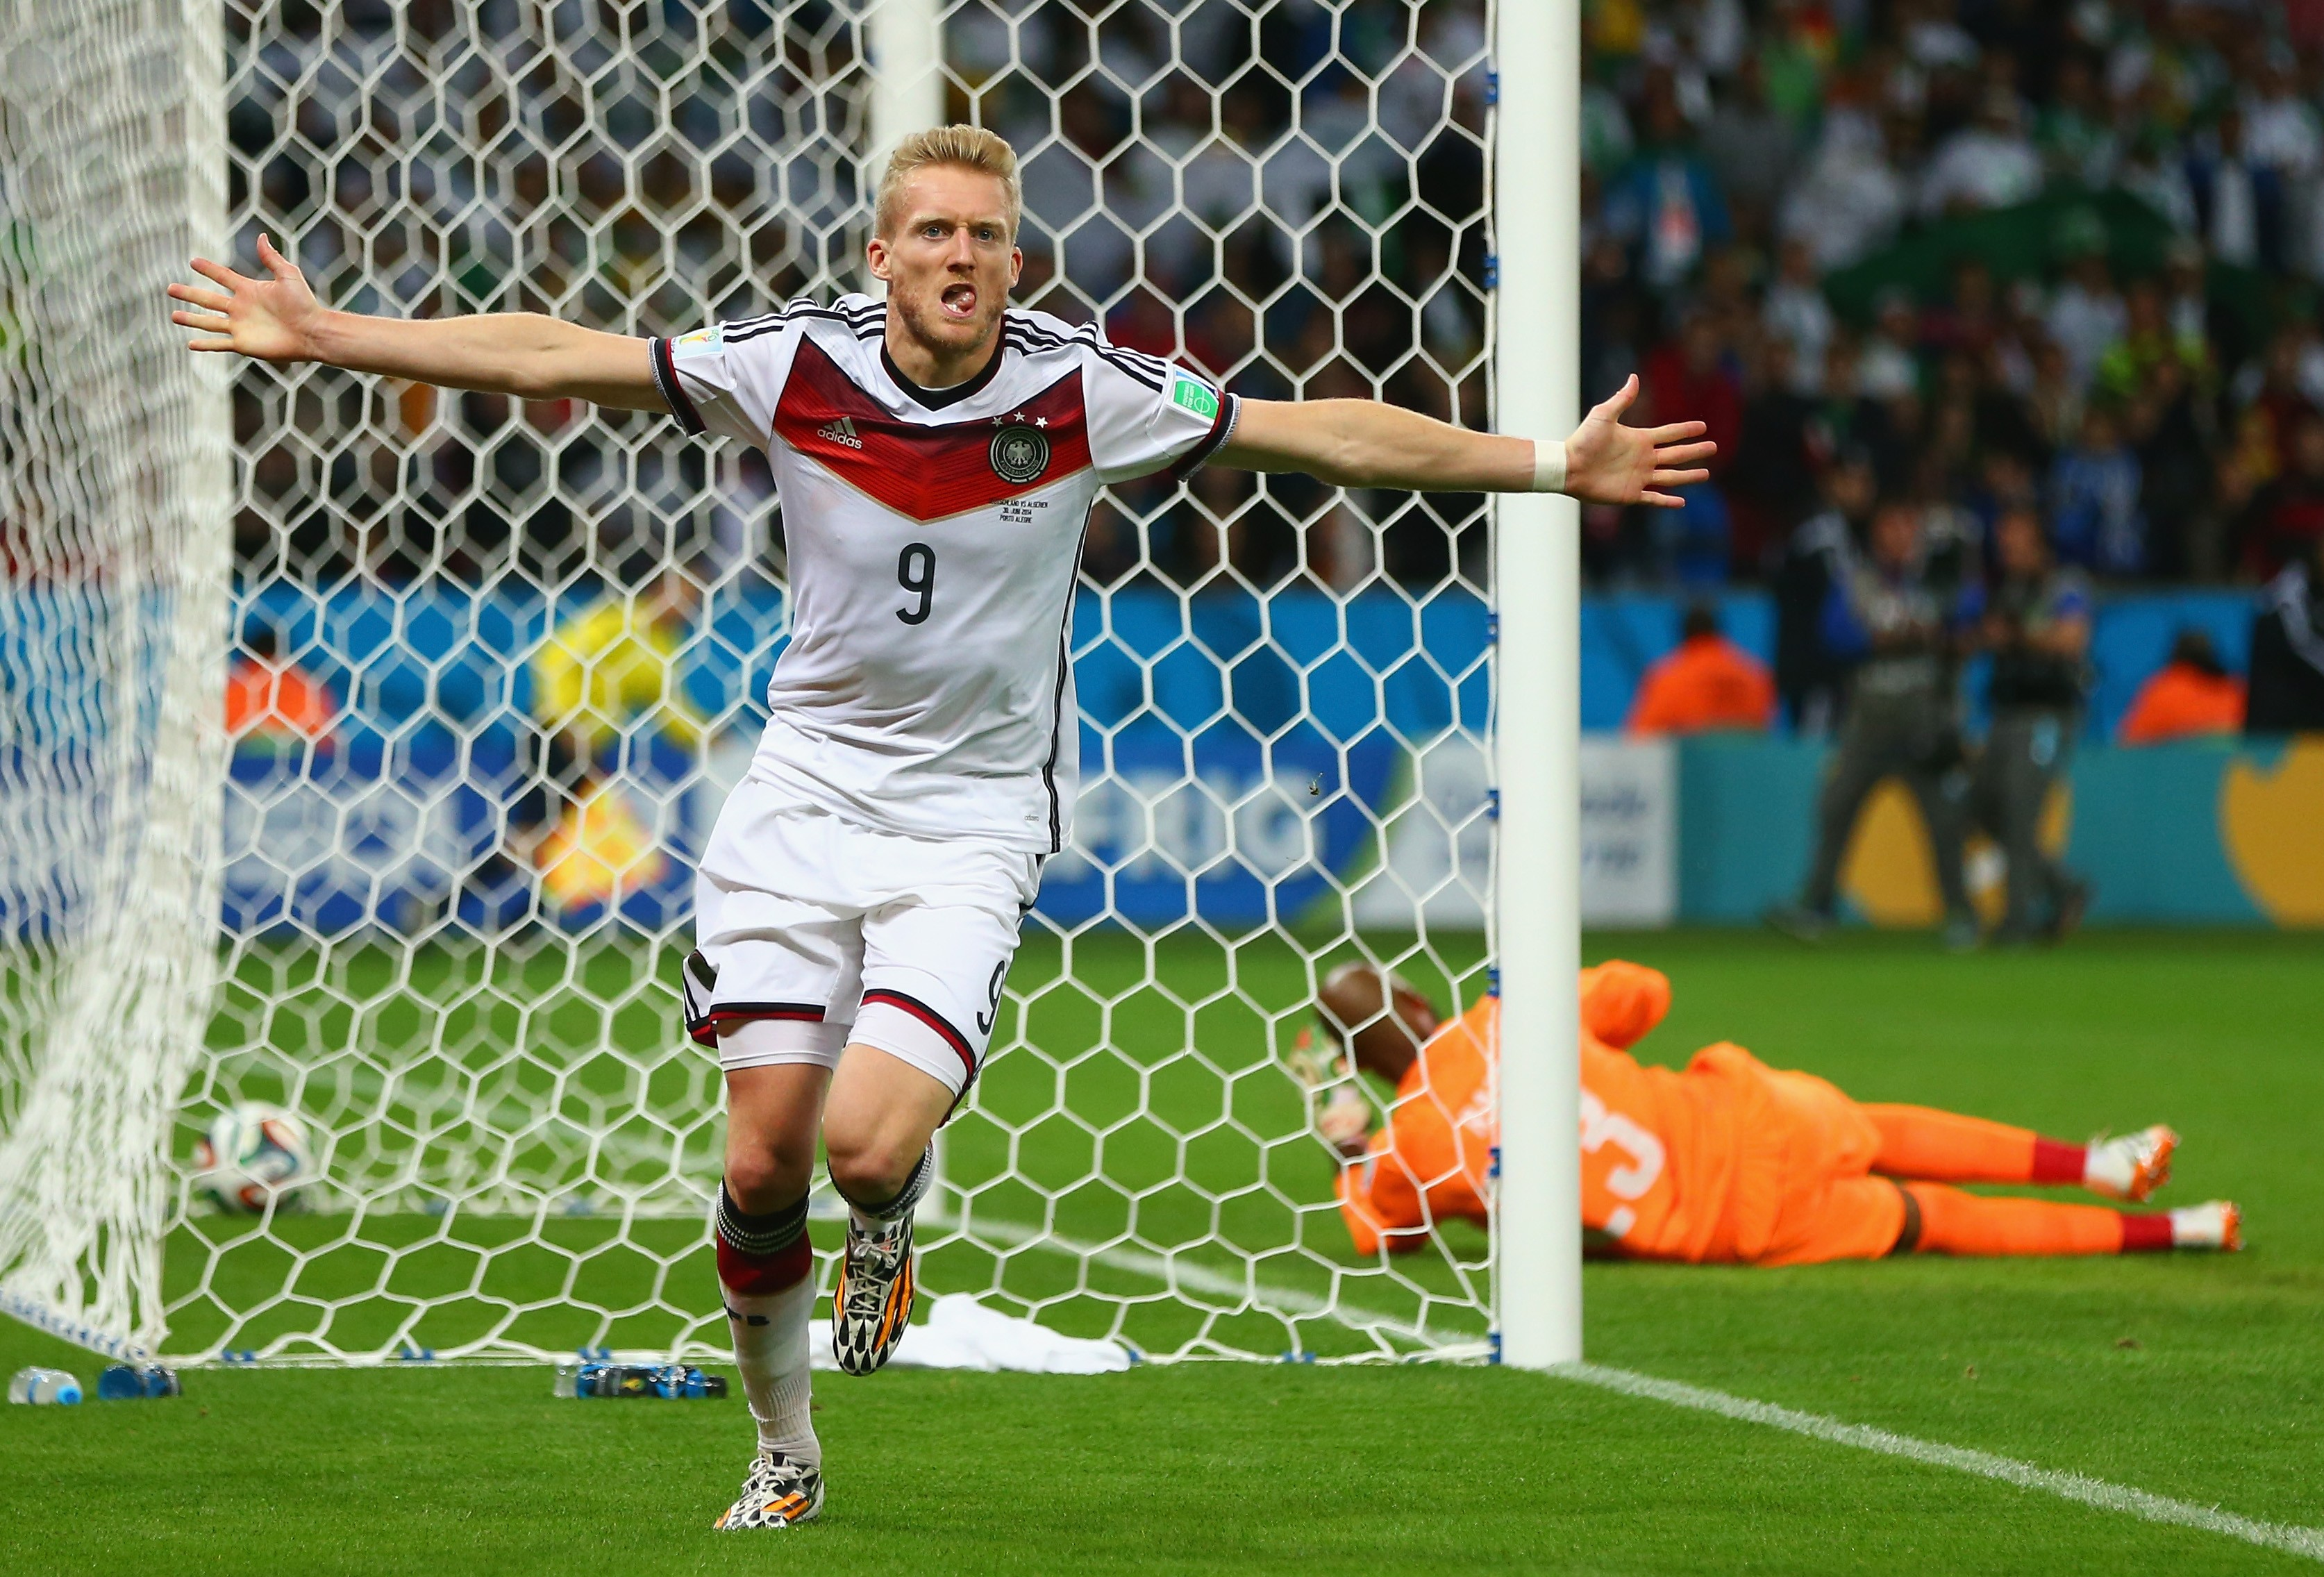 Футбол. чм германия прогноз алжир 2017. 1 8.